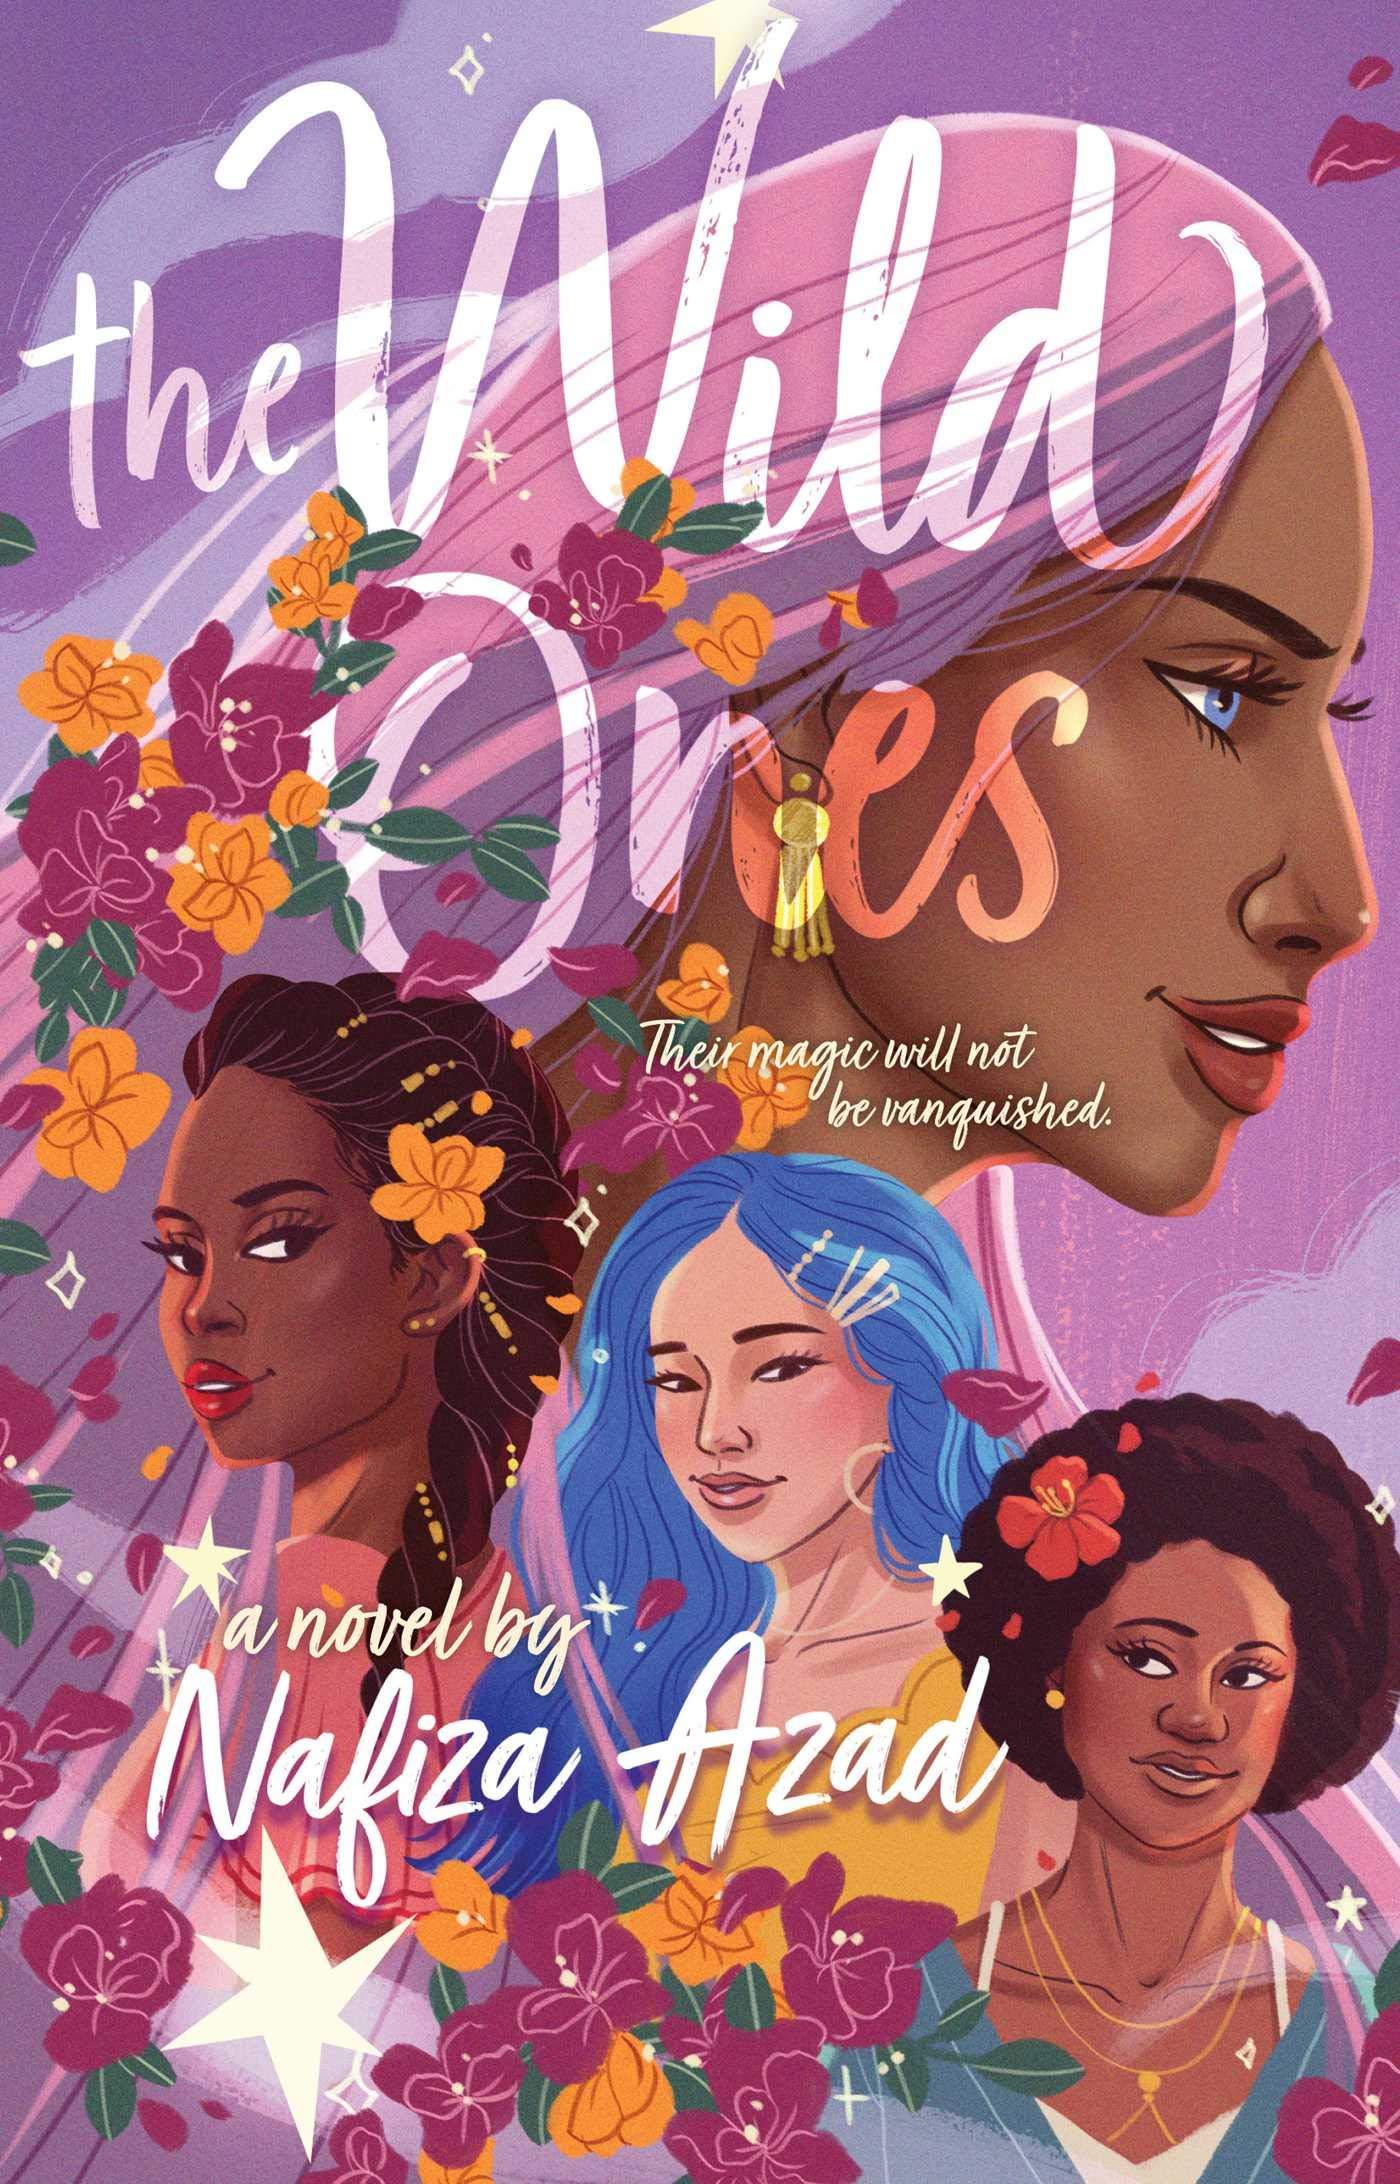 Amazon.com: The Wild Ones: 9781534484962: Azad, Nafiza: Books